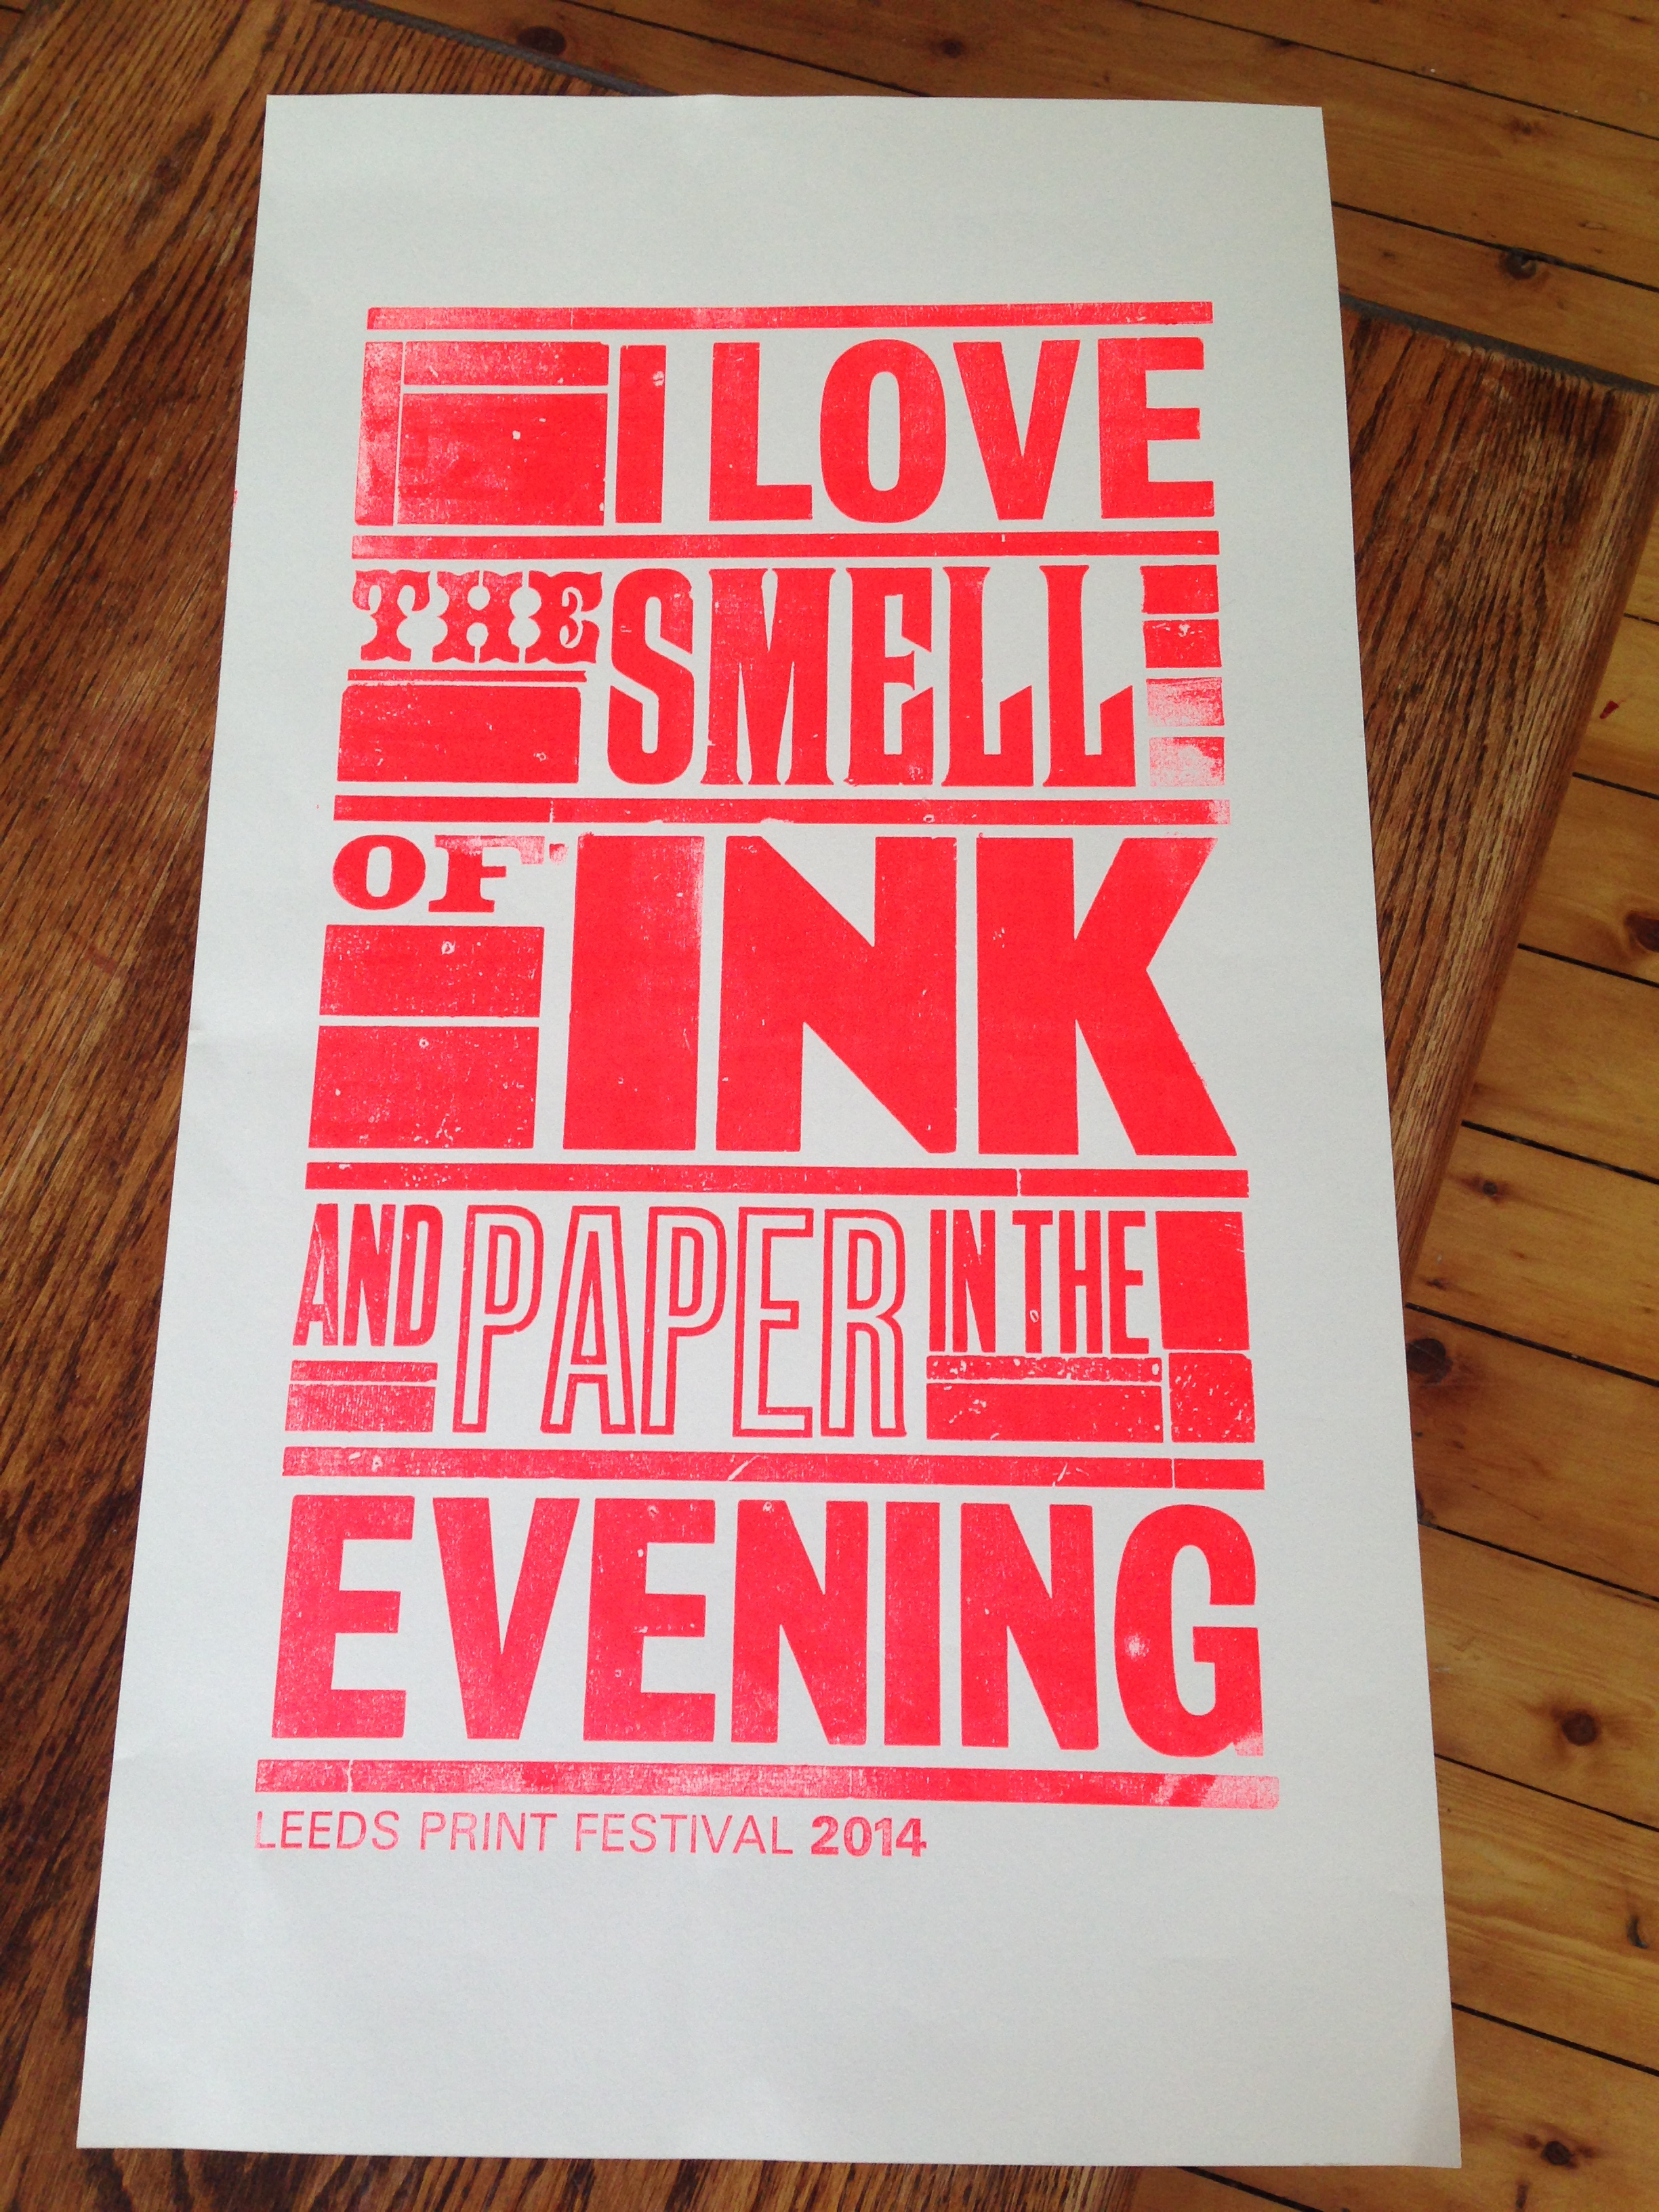 Leeds Print Festival letterpress